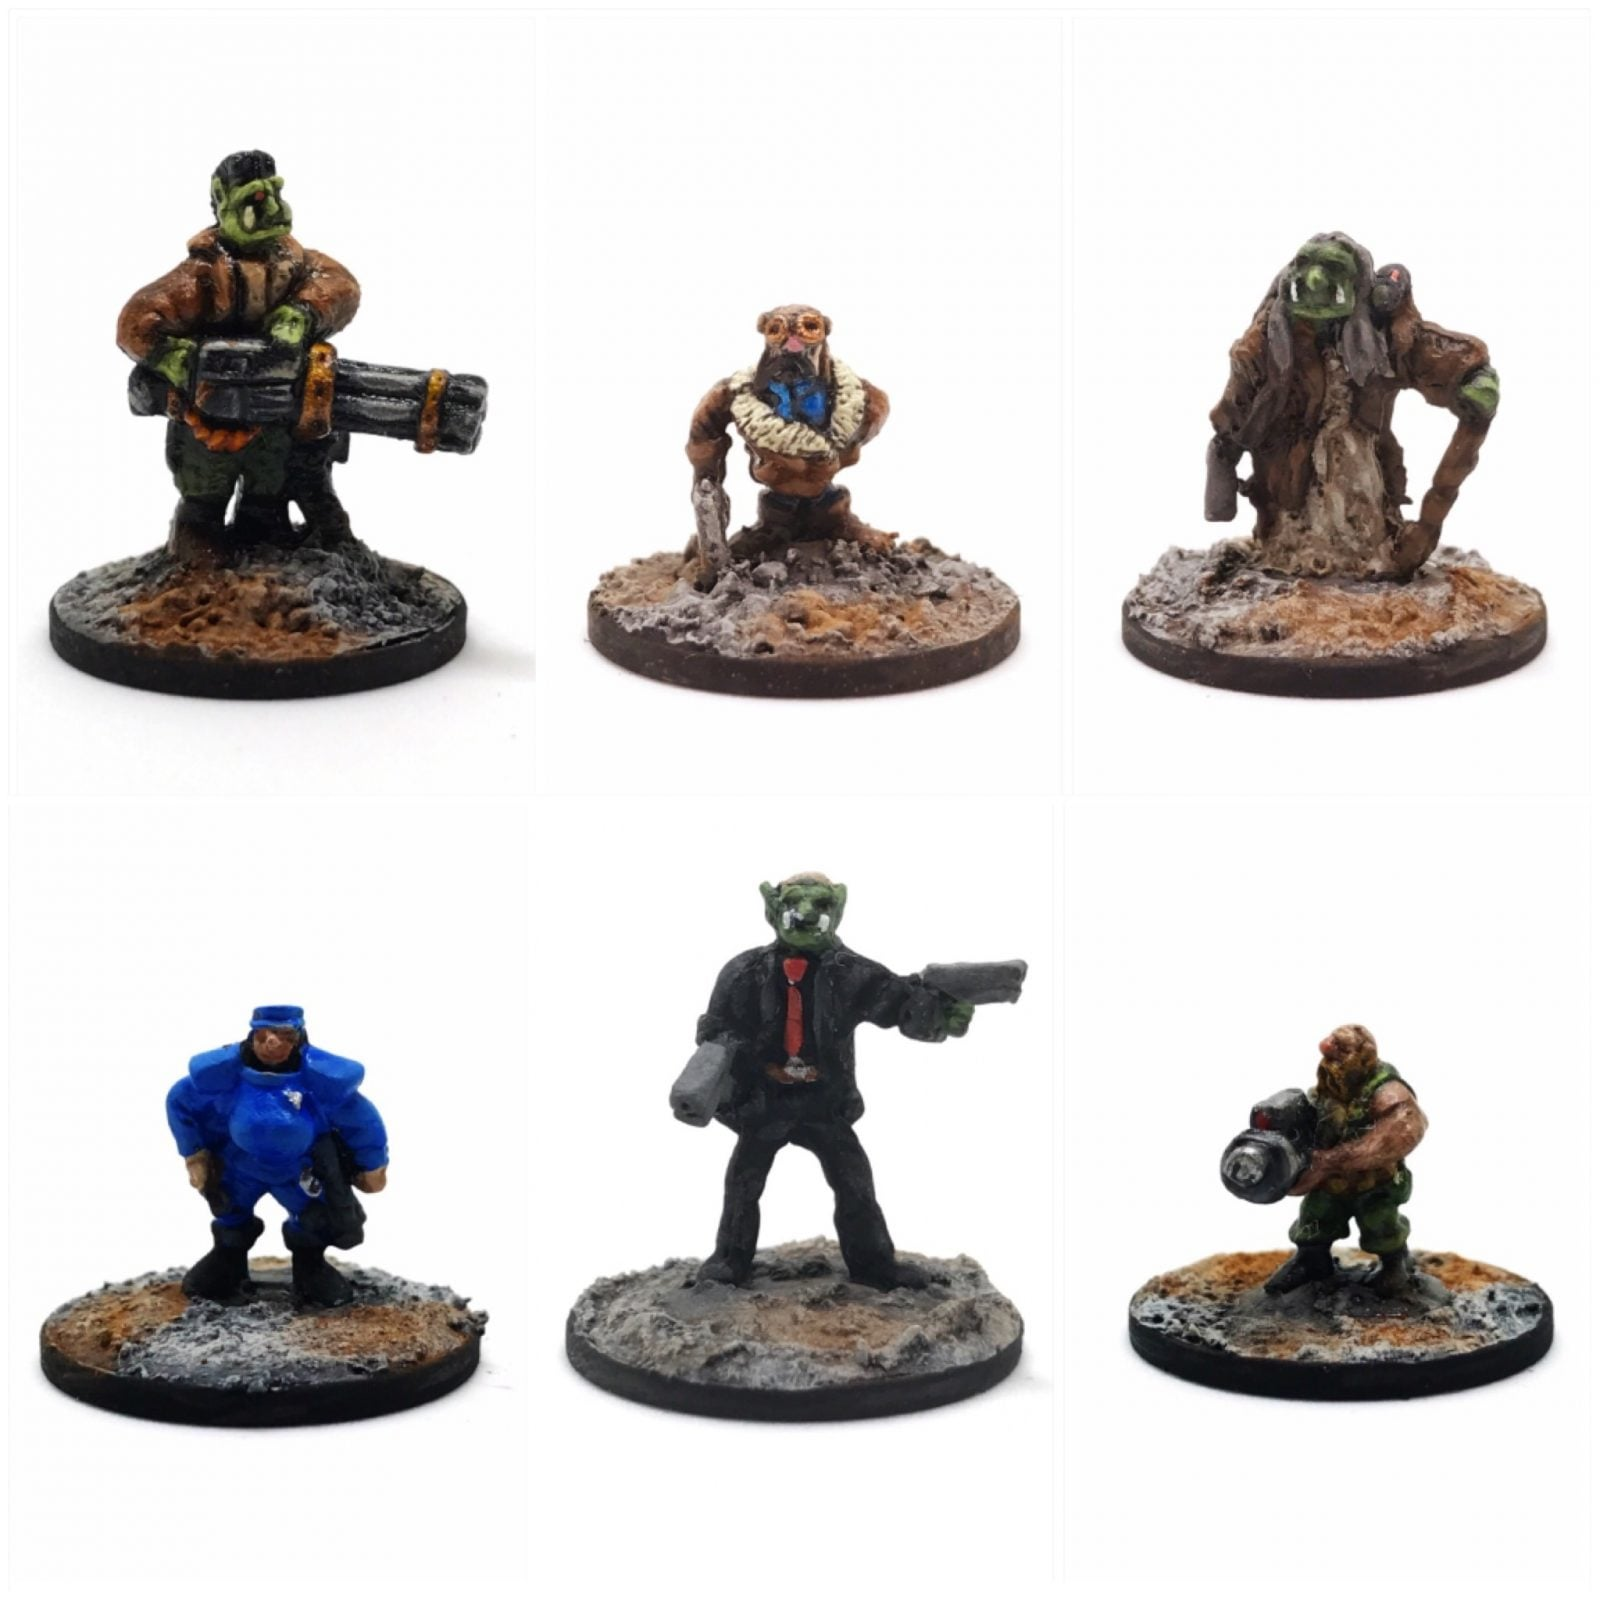 Cyberpunk Fantasy – Pack 1